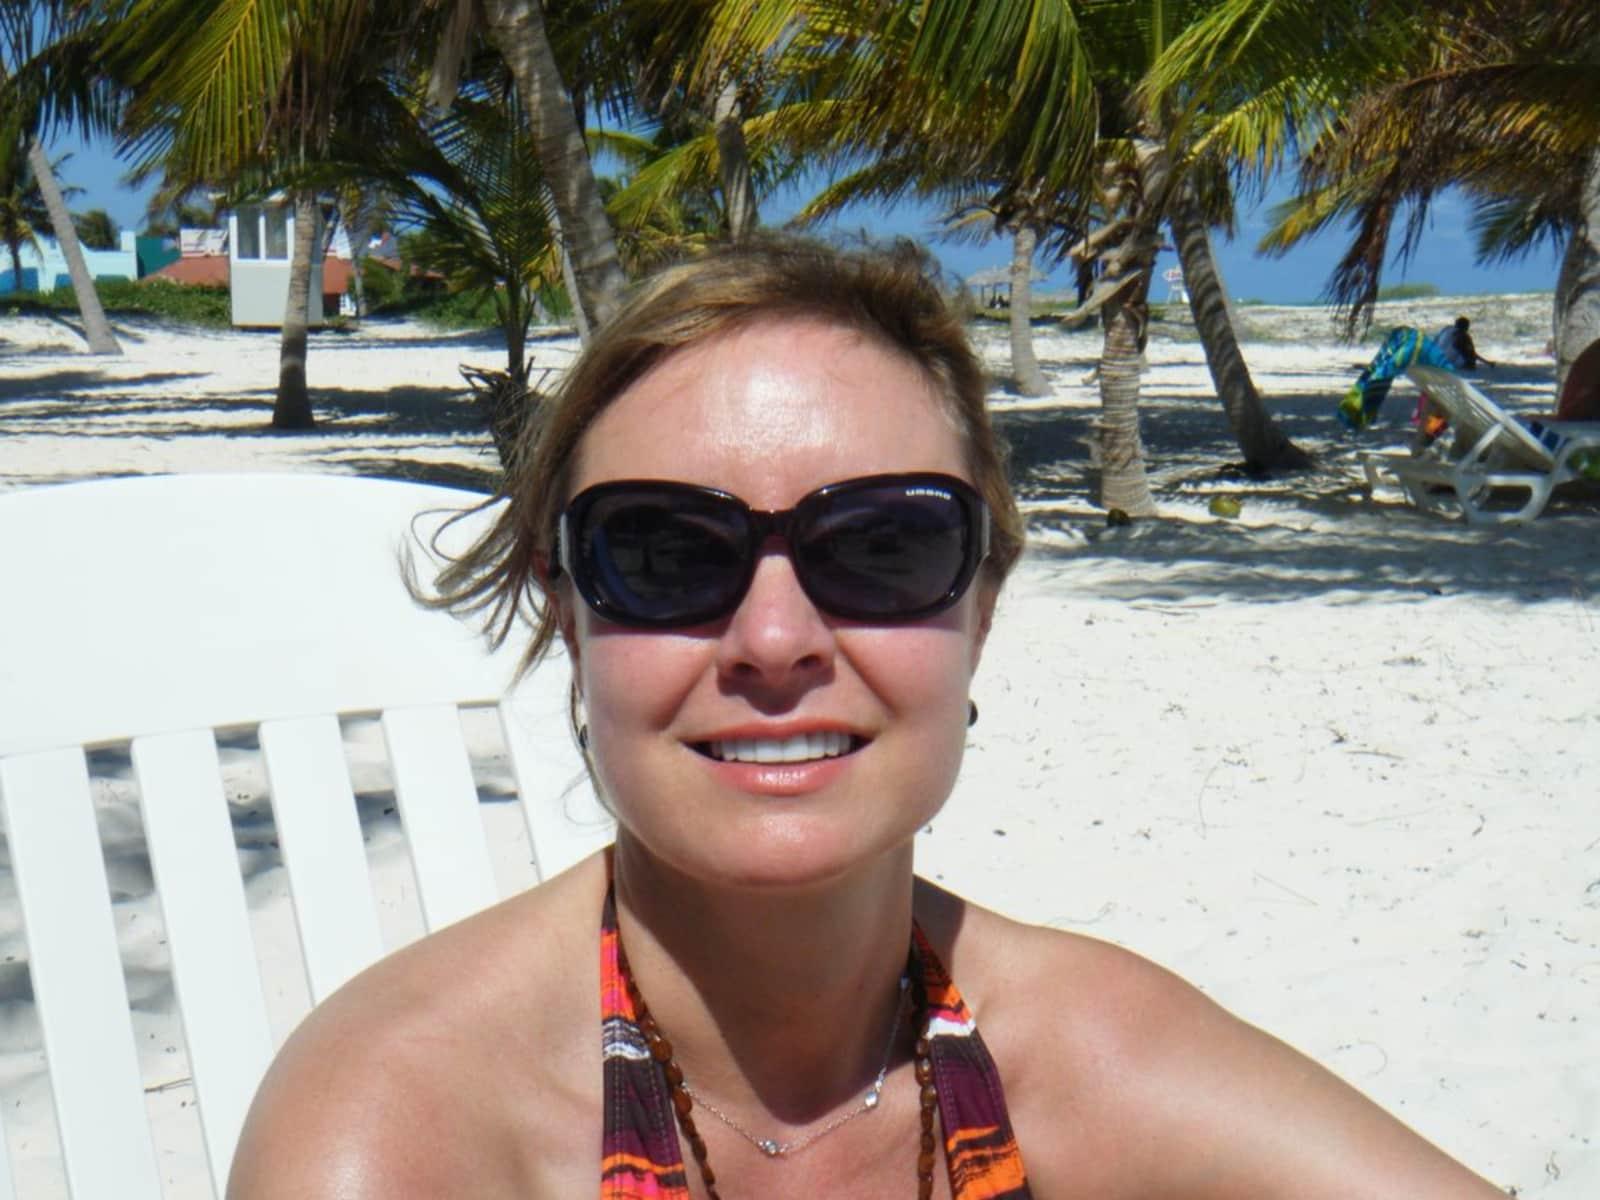 Catherine from Greater Sudbury, Ontario, Canada